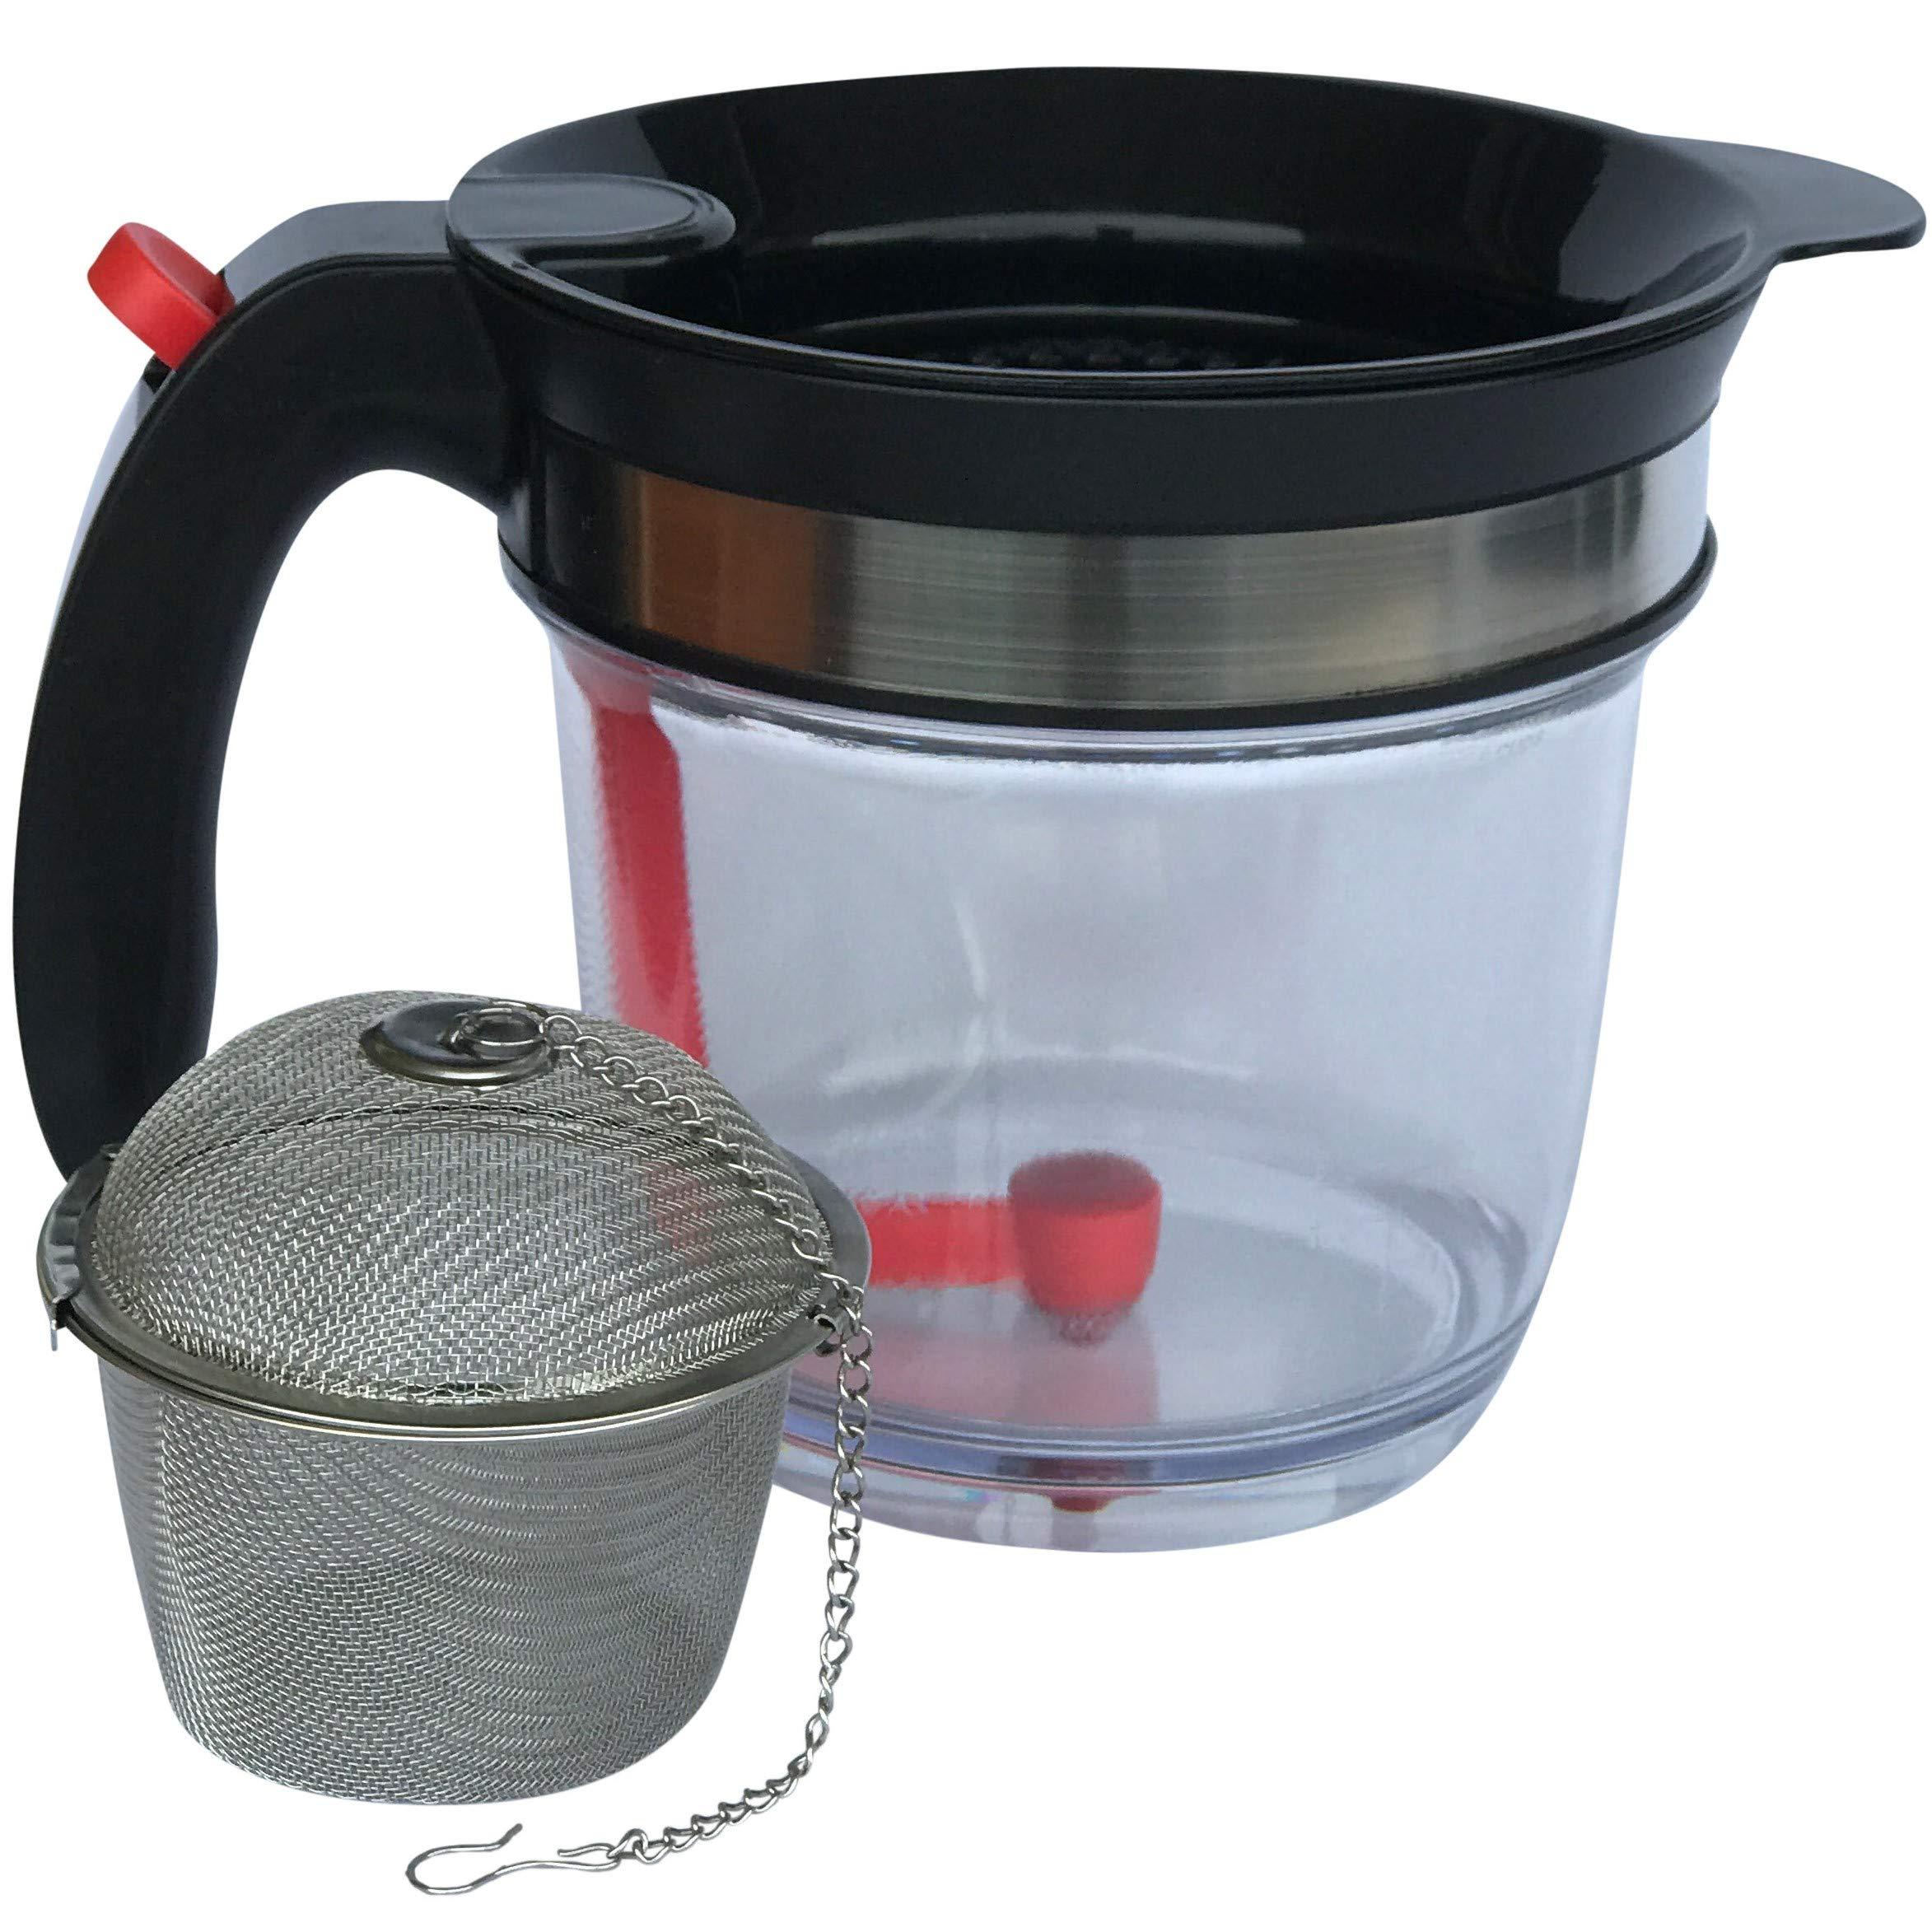 Fat Separator by JustGoSmarter - Also Works as Tea Infuser, Fruit Infuser, Pancake Batter Dispenser - Measuring Cup with Bottom Release - Gravy Strainer, Oil Separator, Grease Separator - 4-Cups